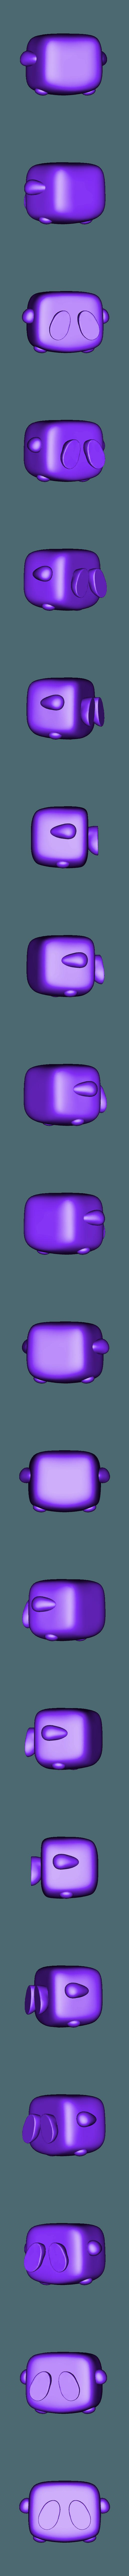 kirby_stl.stl Télécharger fichier STL gratuit funko pop kirby • Modèle à imprimer en 3D, tamaliteitor123